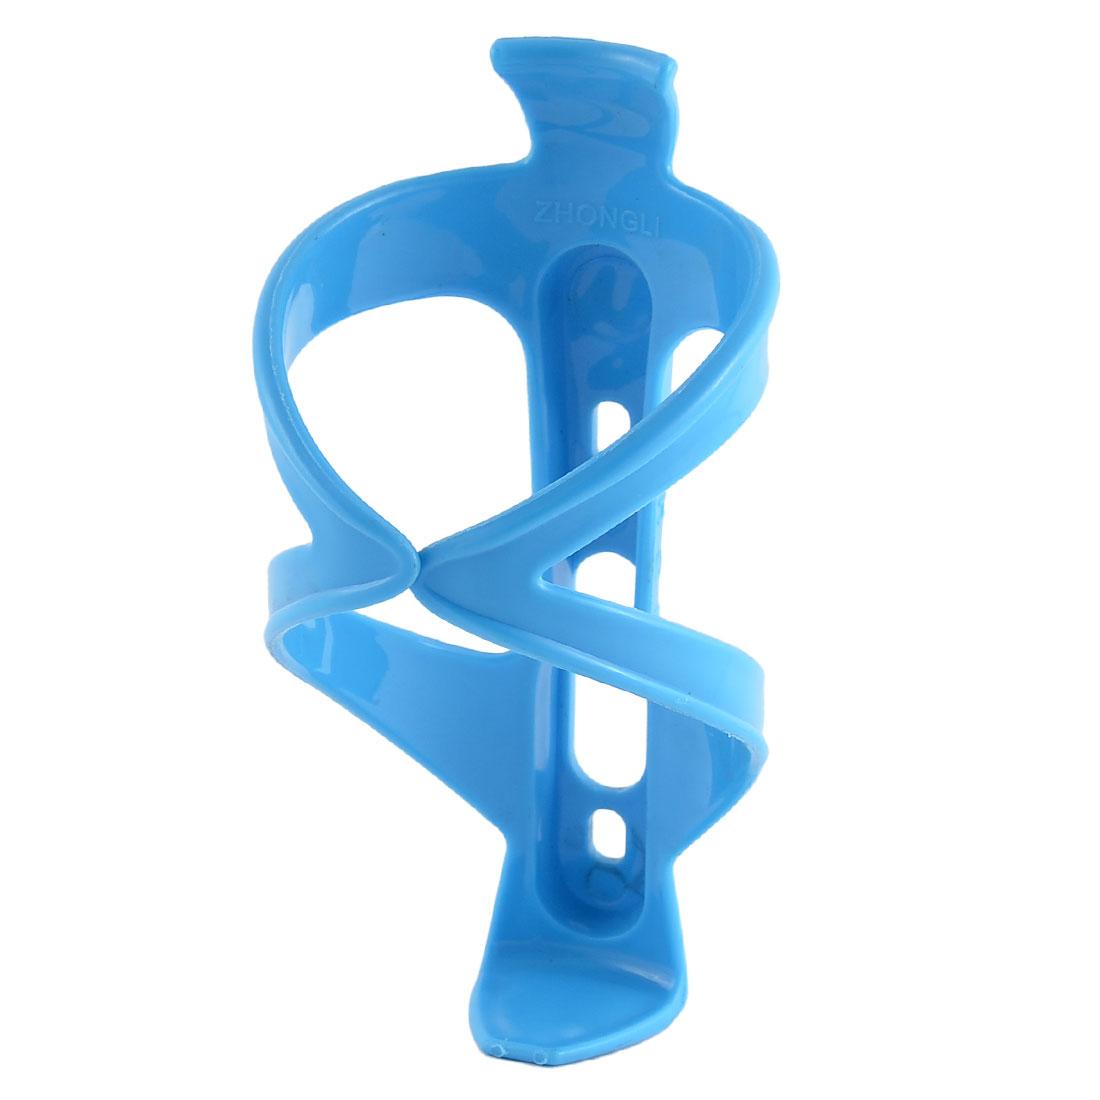 Bike Bicycles Plastic Water Bottle Holder Bracket Cage 6.4cm Inner Dia